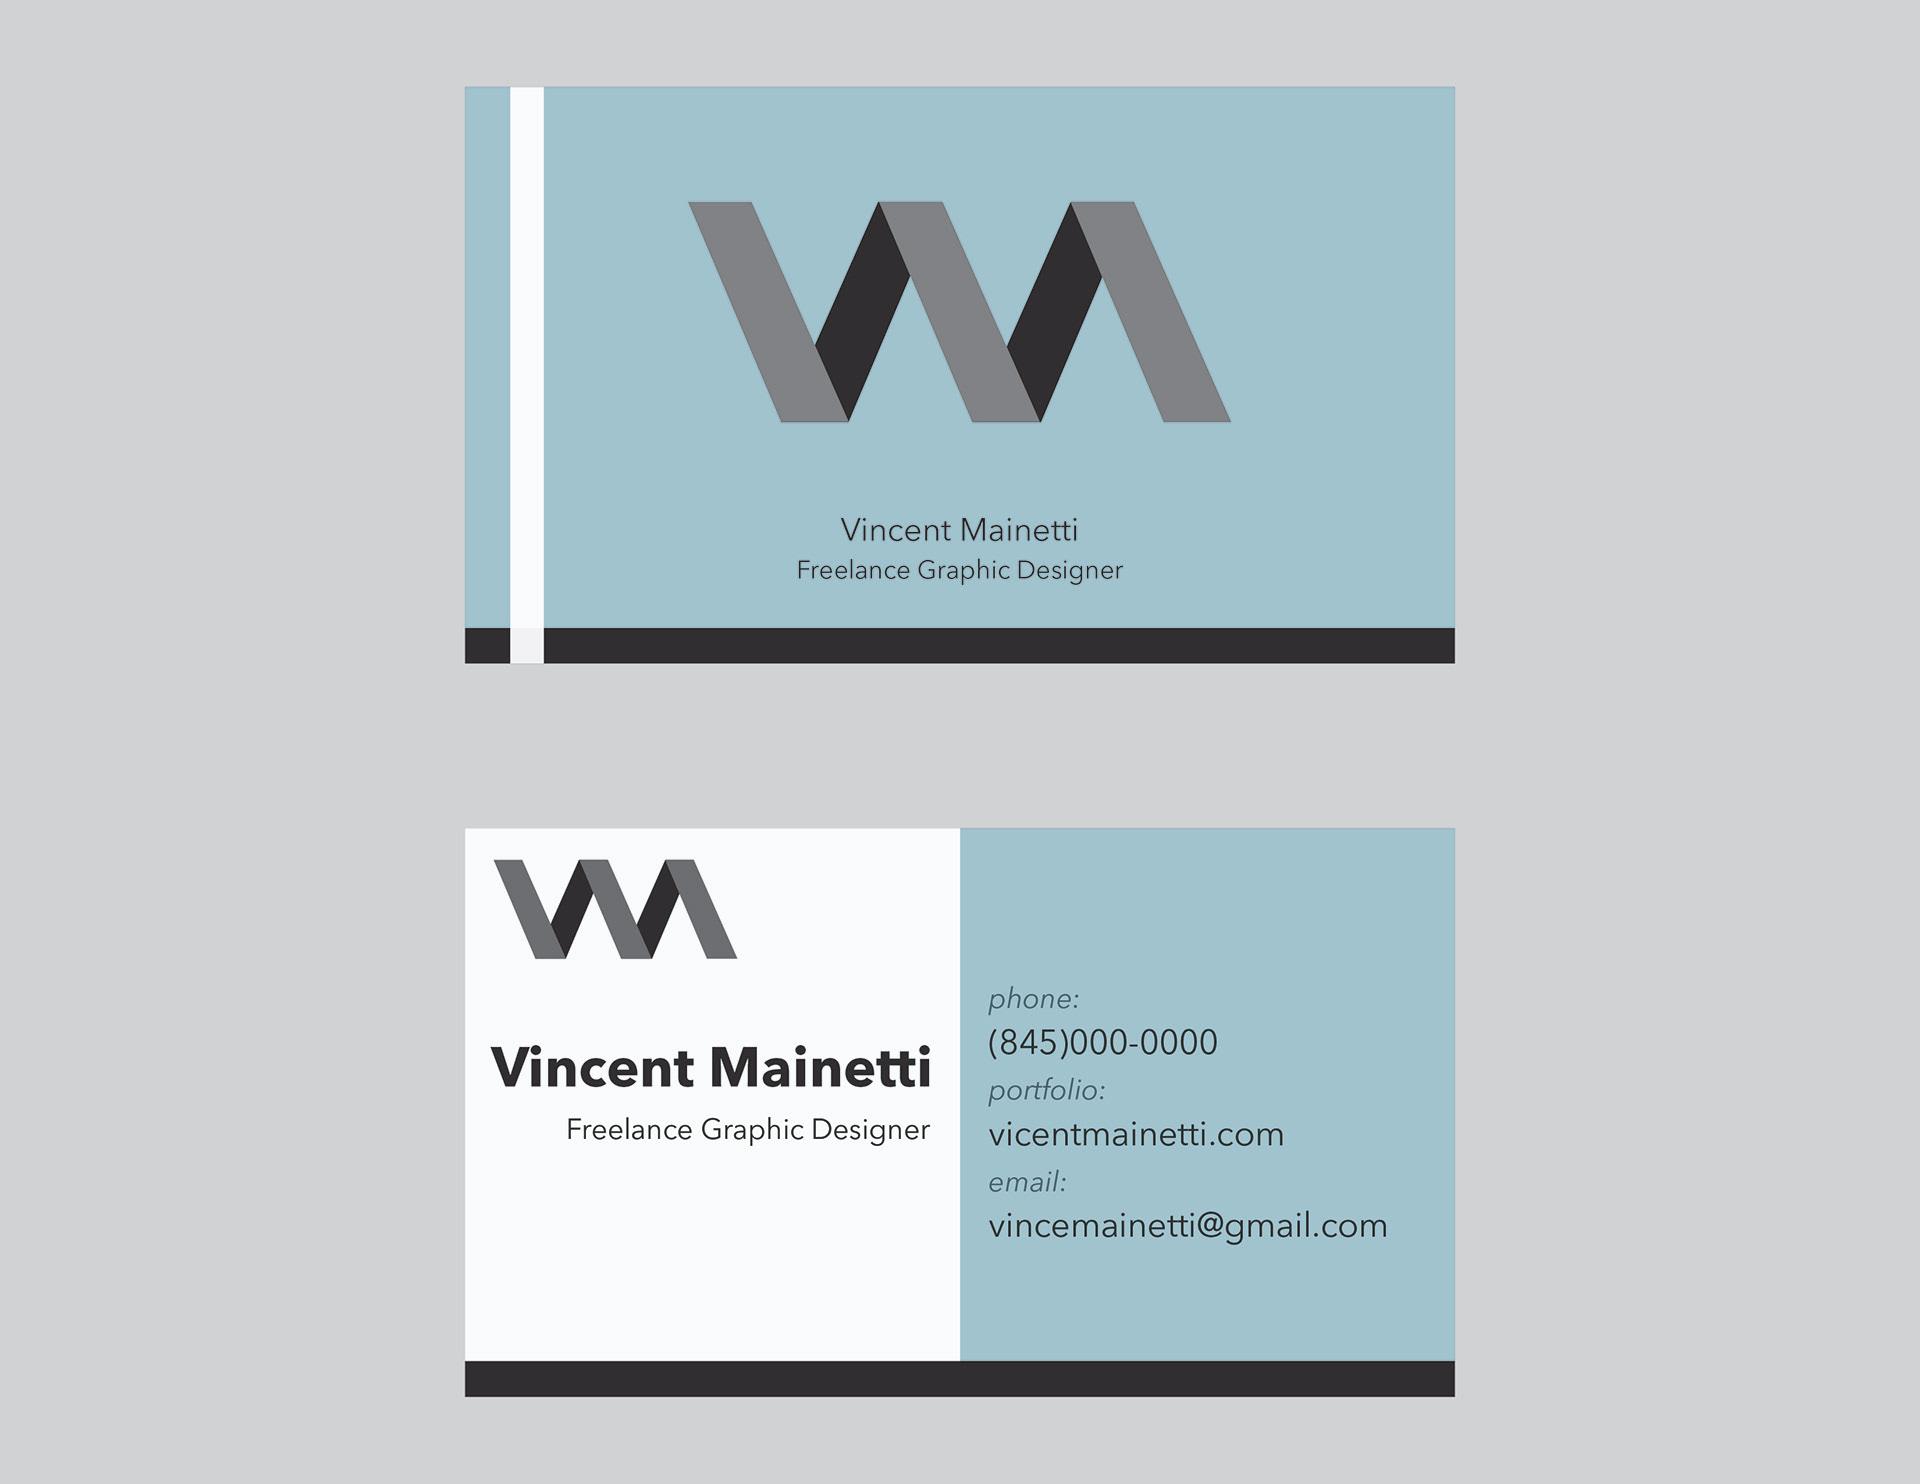 Elyssa VanBenschoten - Freelance Business Card and Logo Design